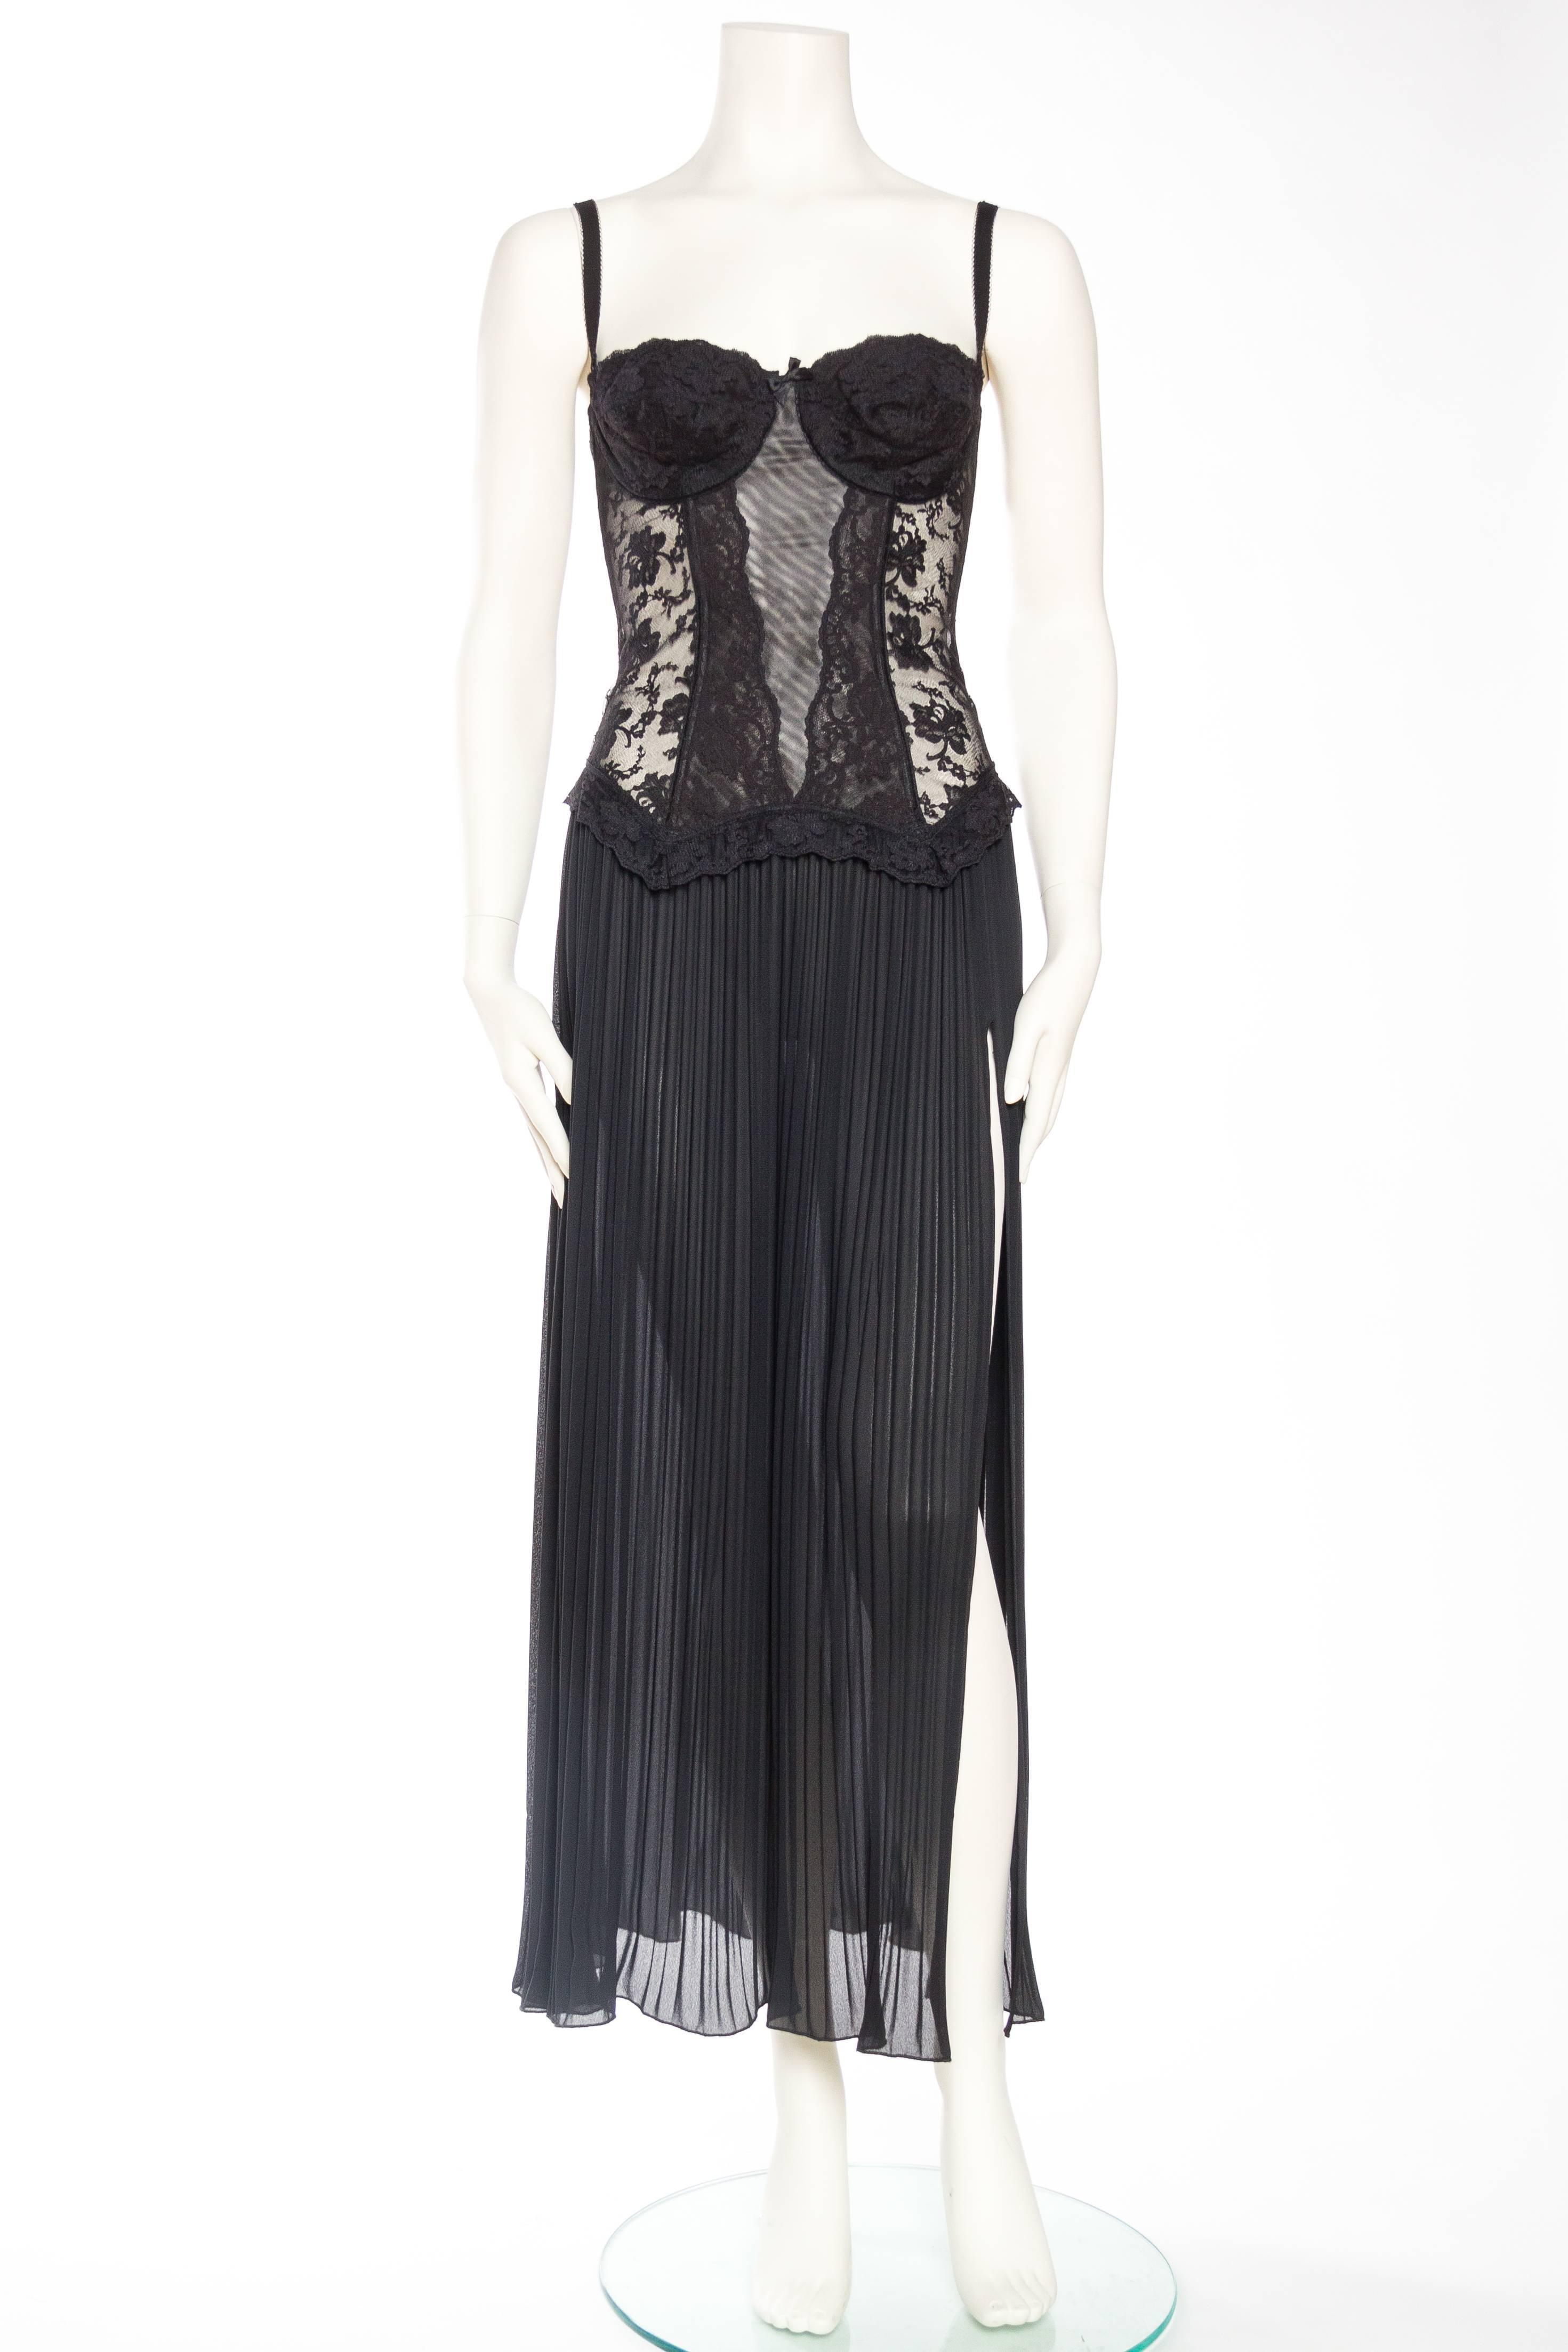 3c3e38062c 1990s Vivienne Tam Sheer Corset Dress at 1stdibs